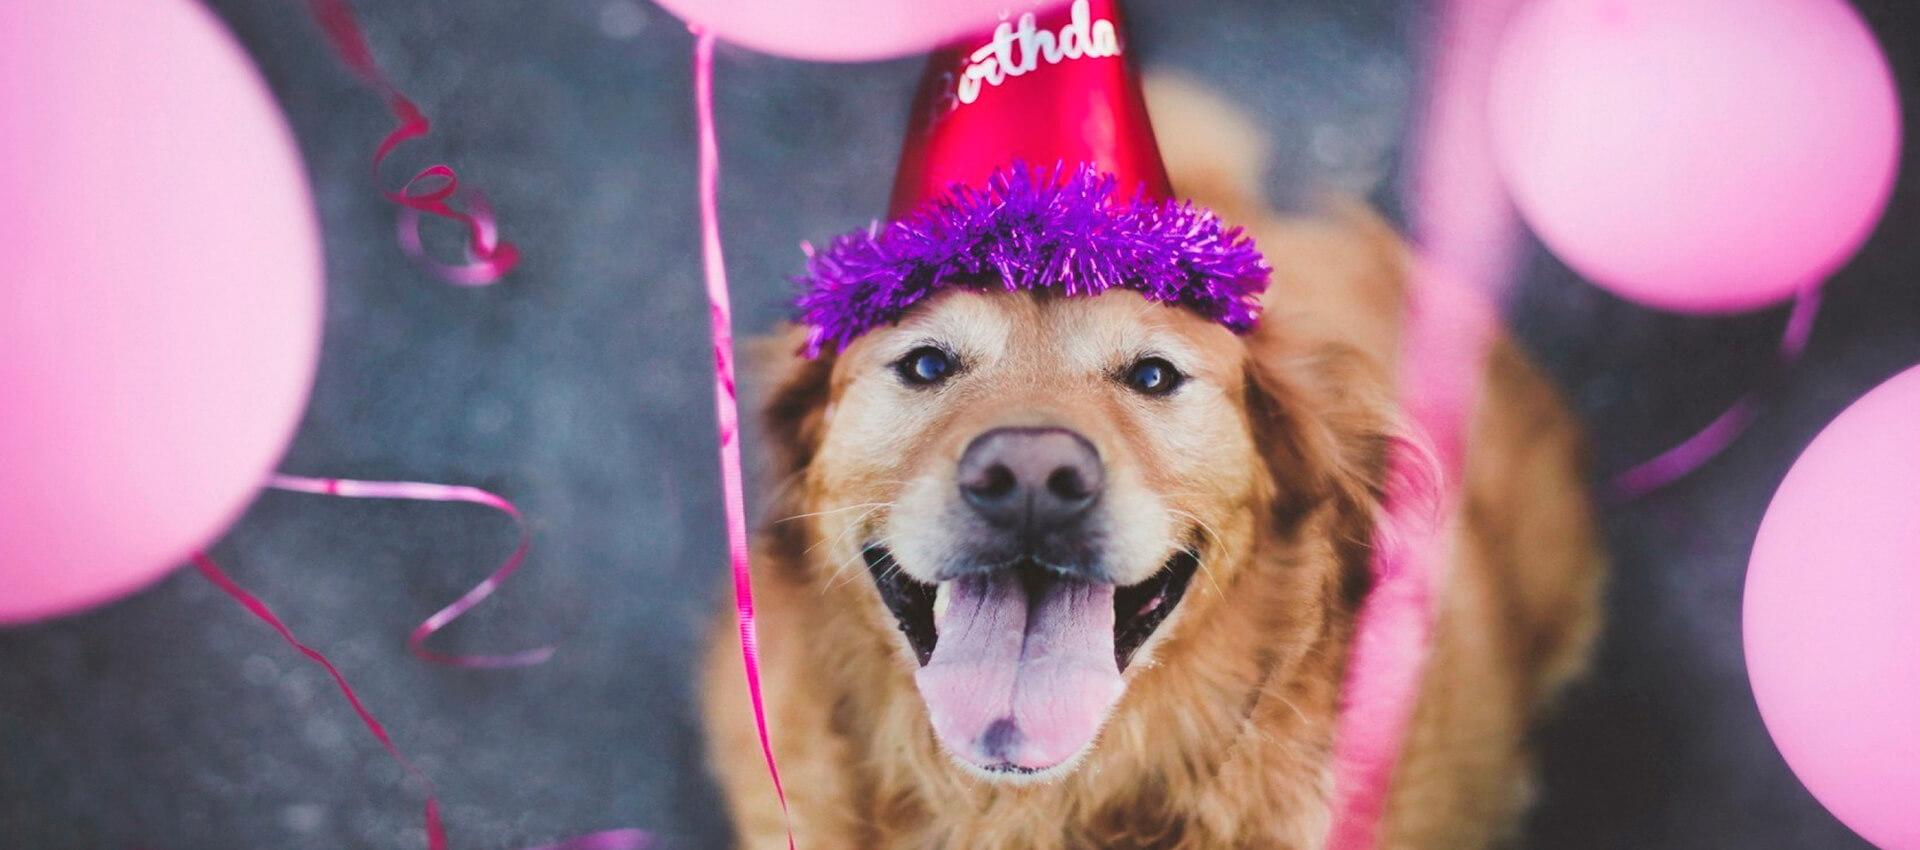 Foto: Aniversário Pet